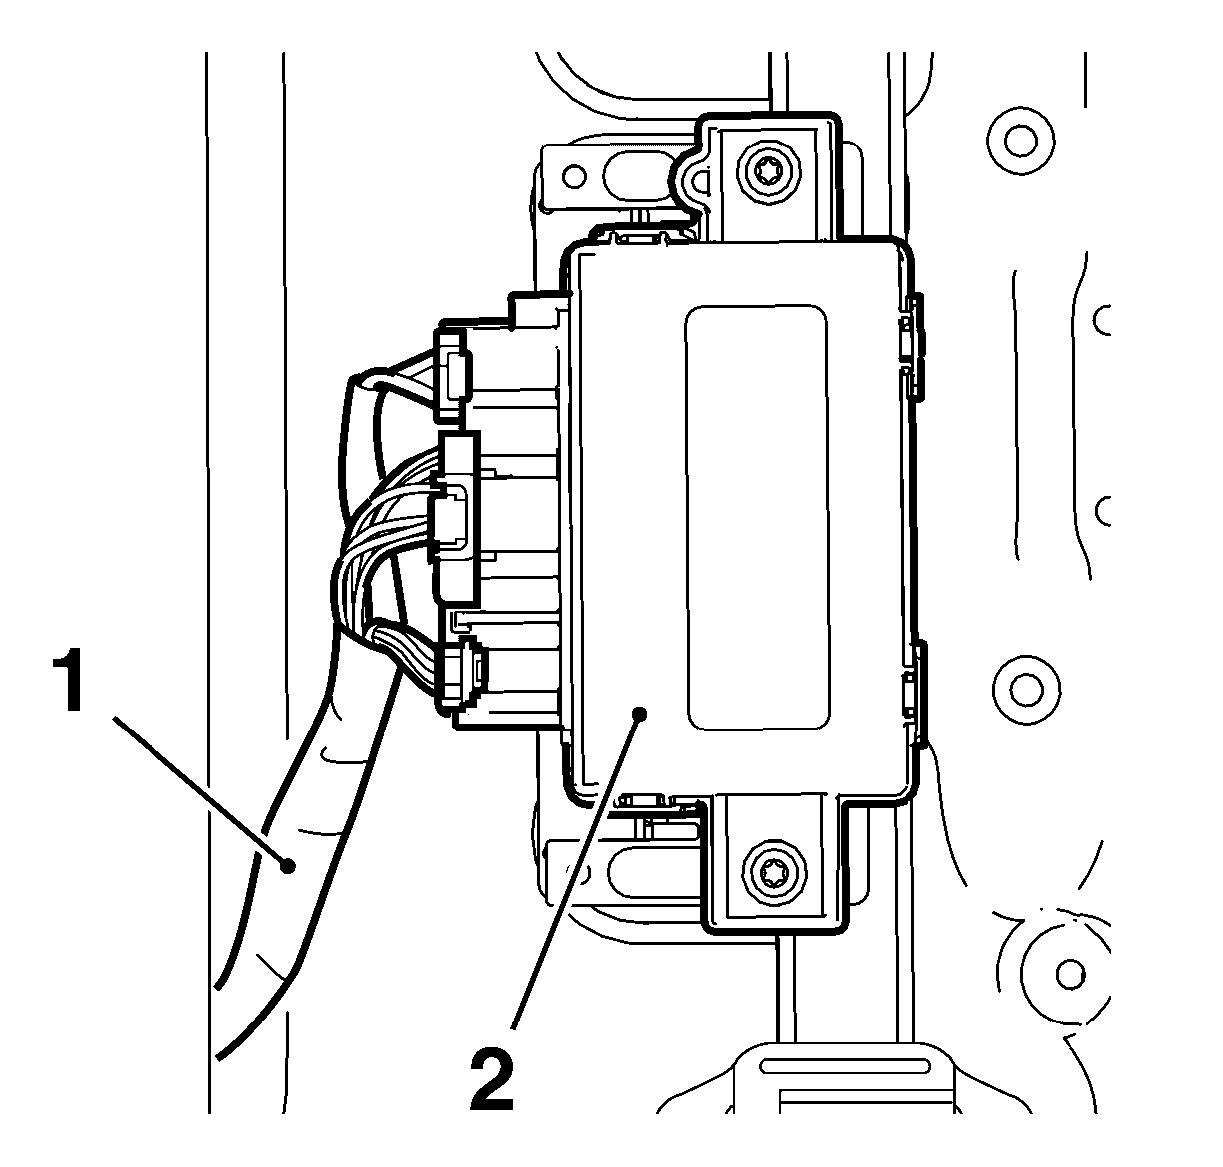 Seat Heating Malfunction Opel Amp Vauxhall